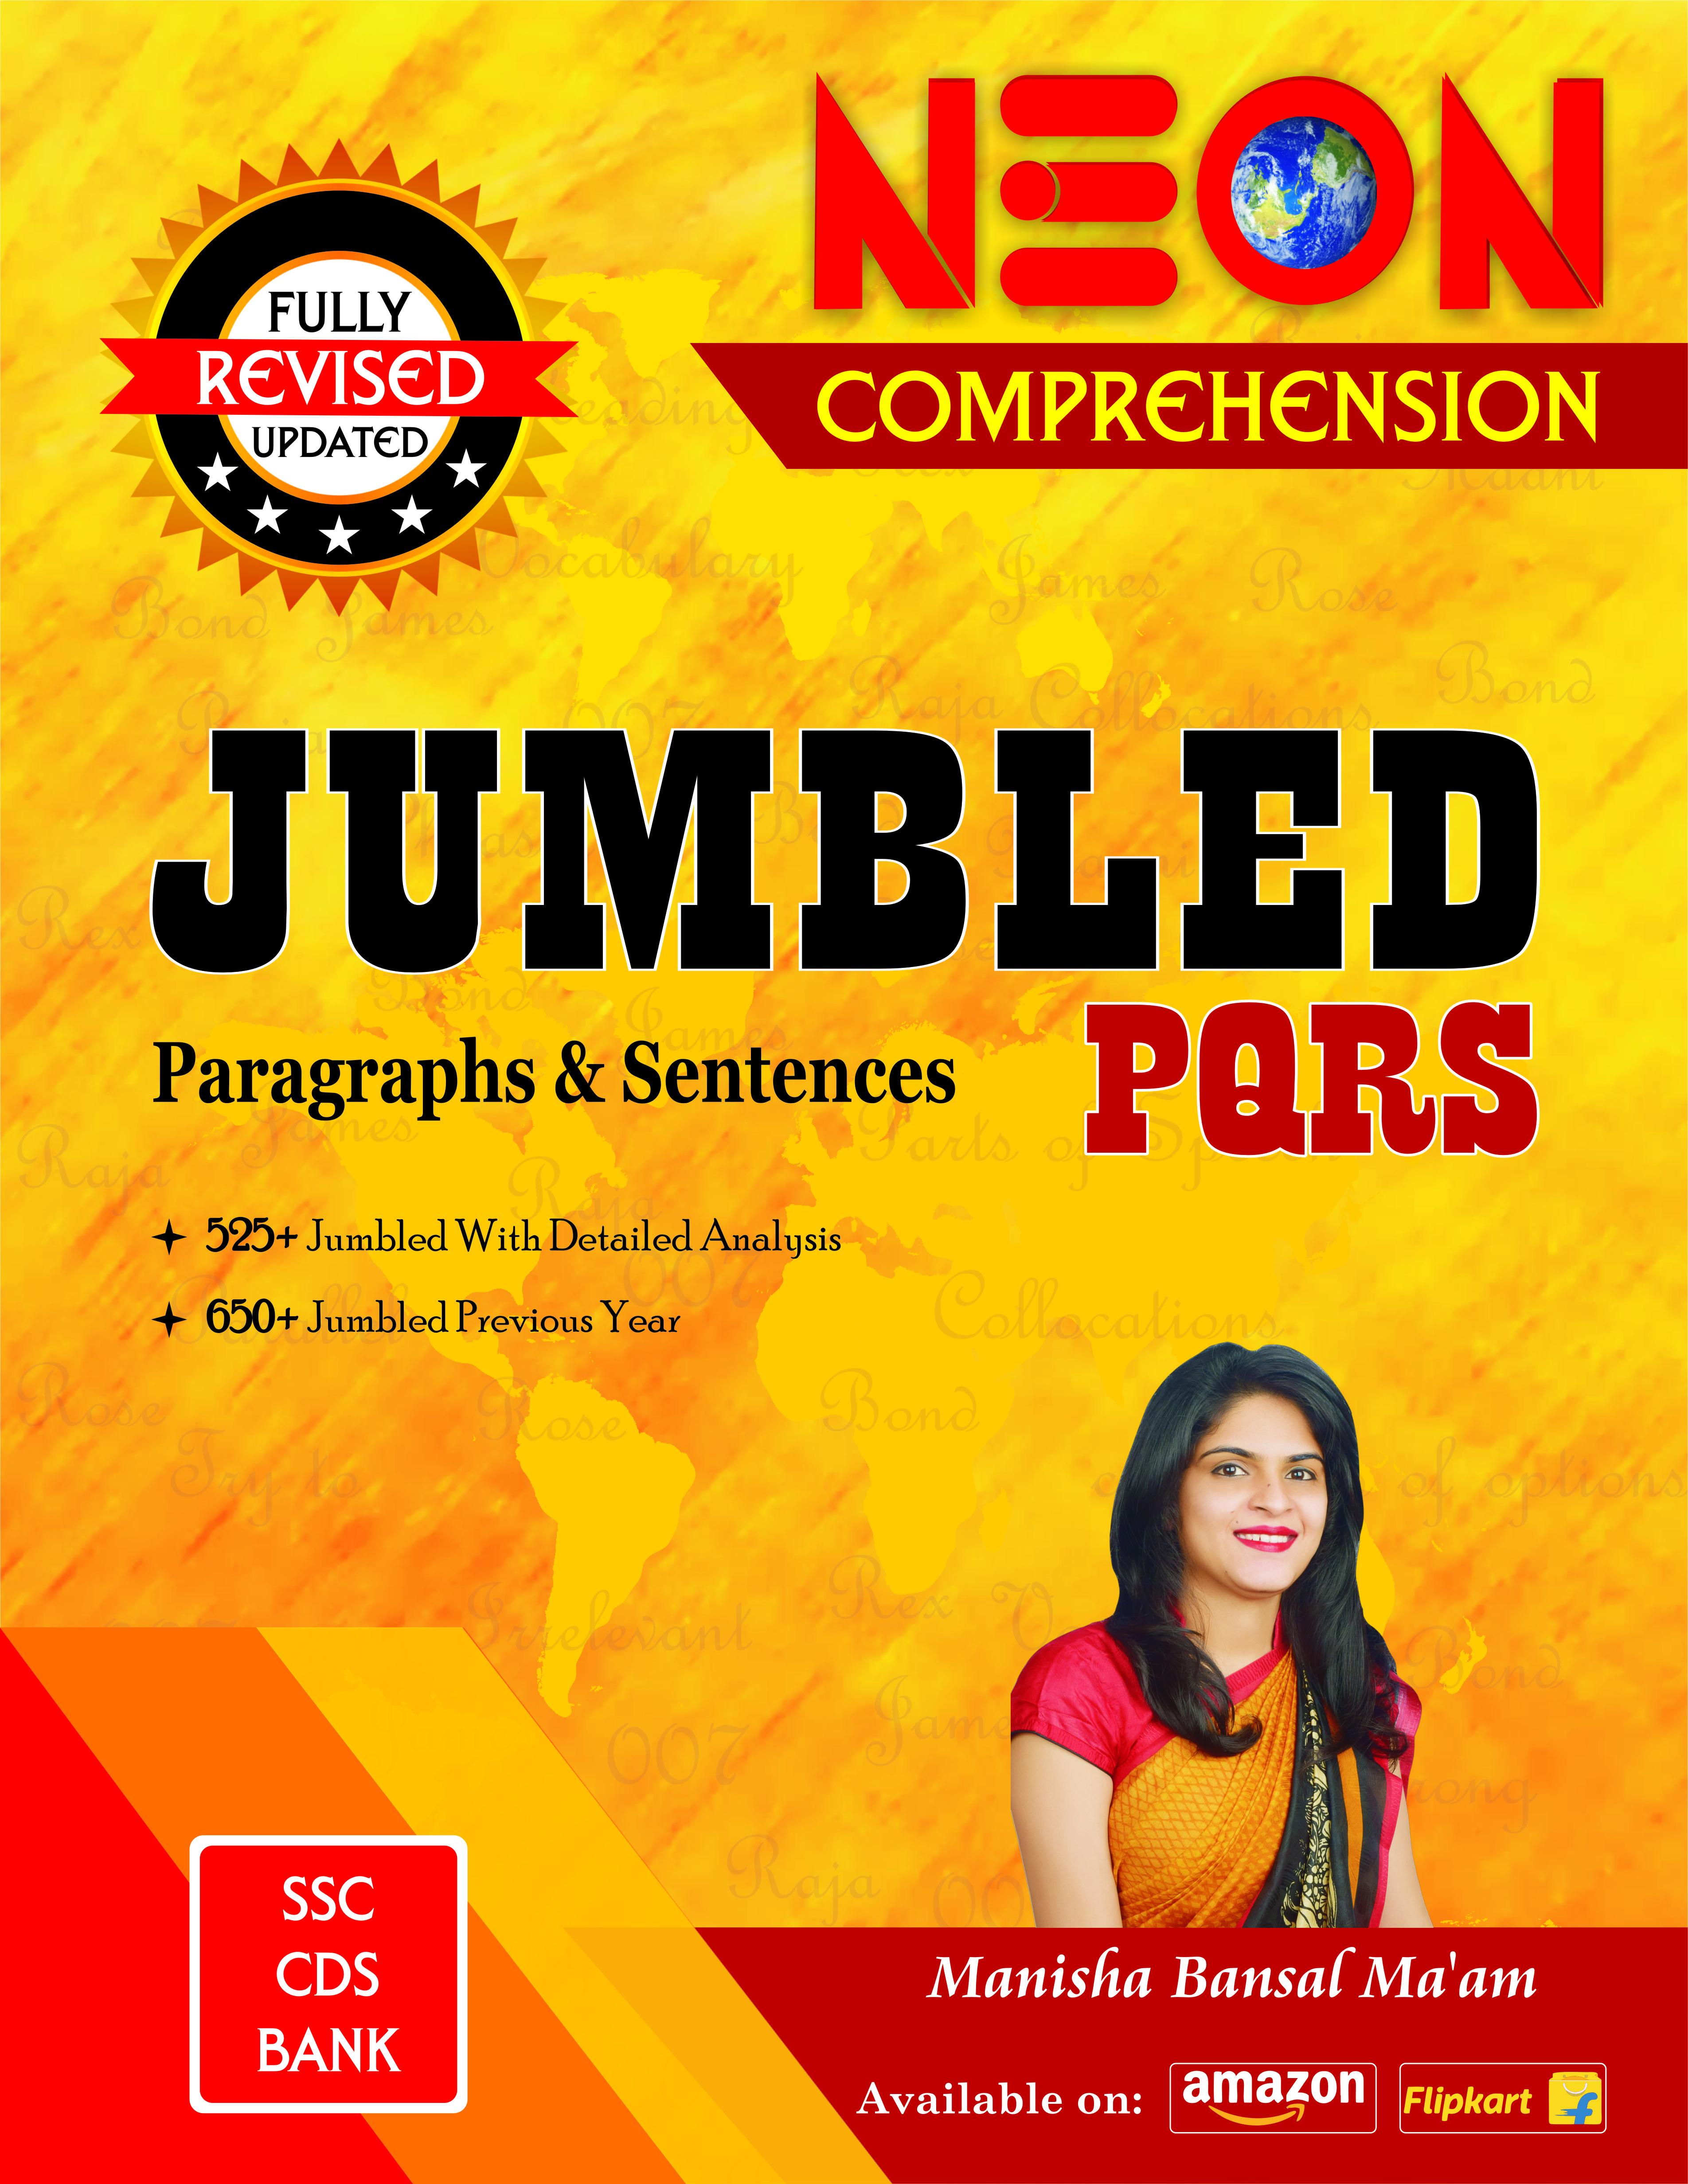 JUMBLED PQRS (Paragraphs & Sentences)